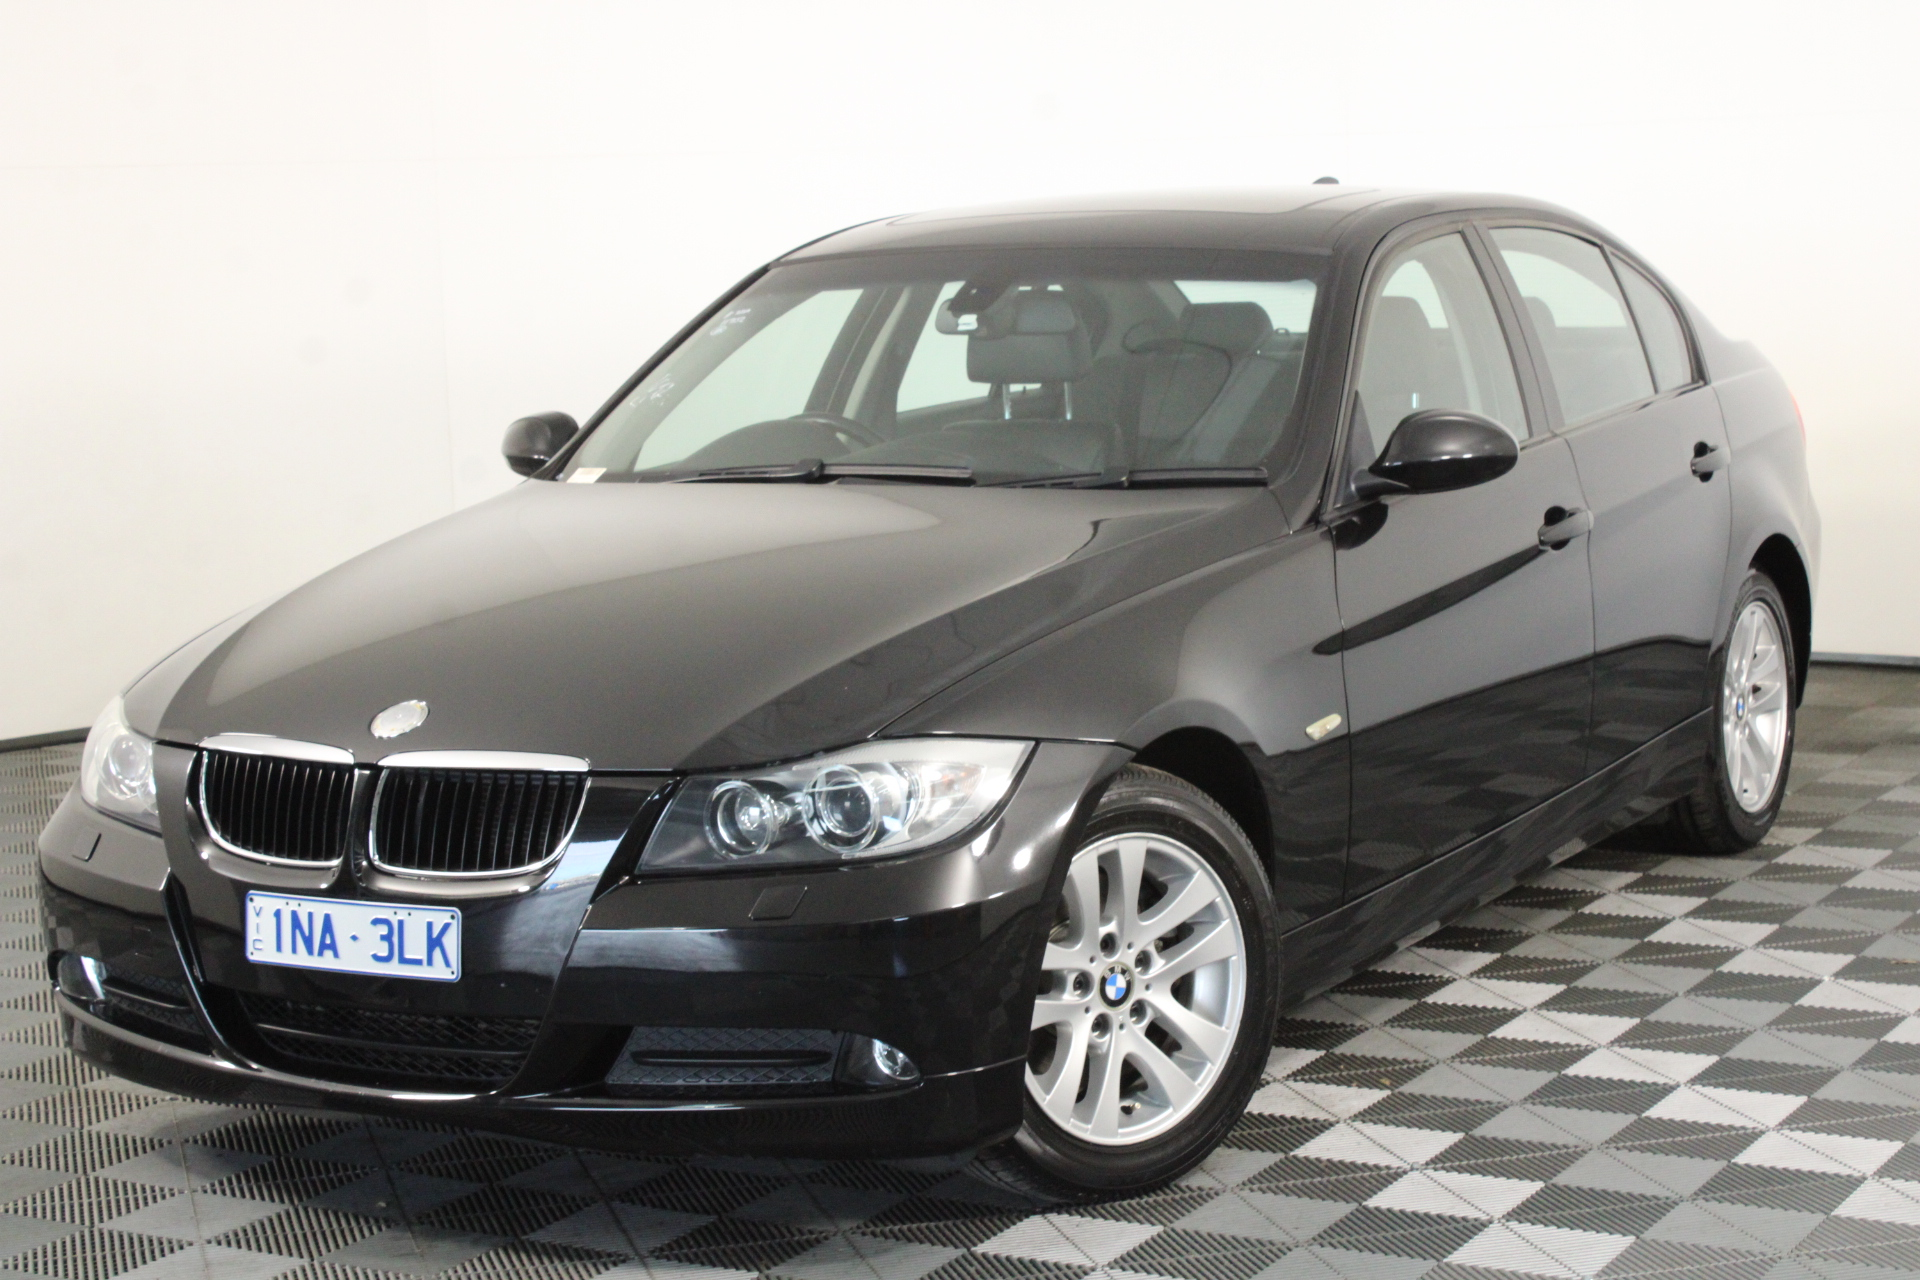 BMW 3 20d E90 Turbo Diesel Automatic Sedan